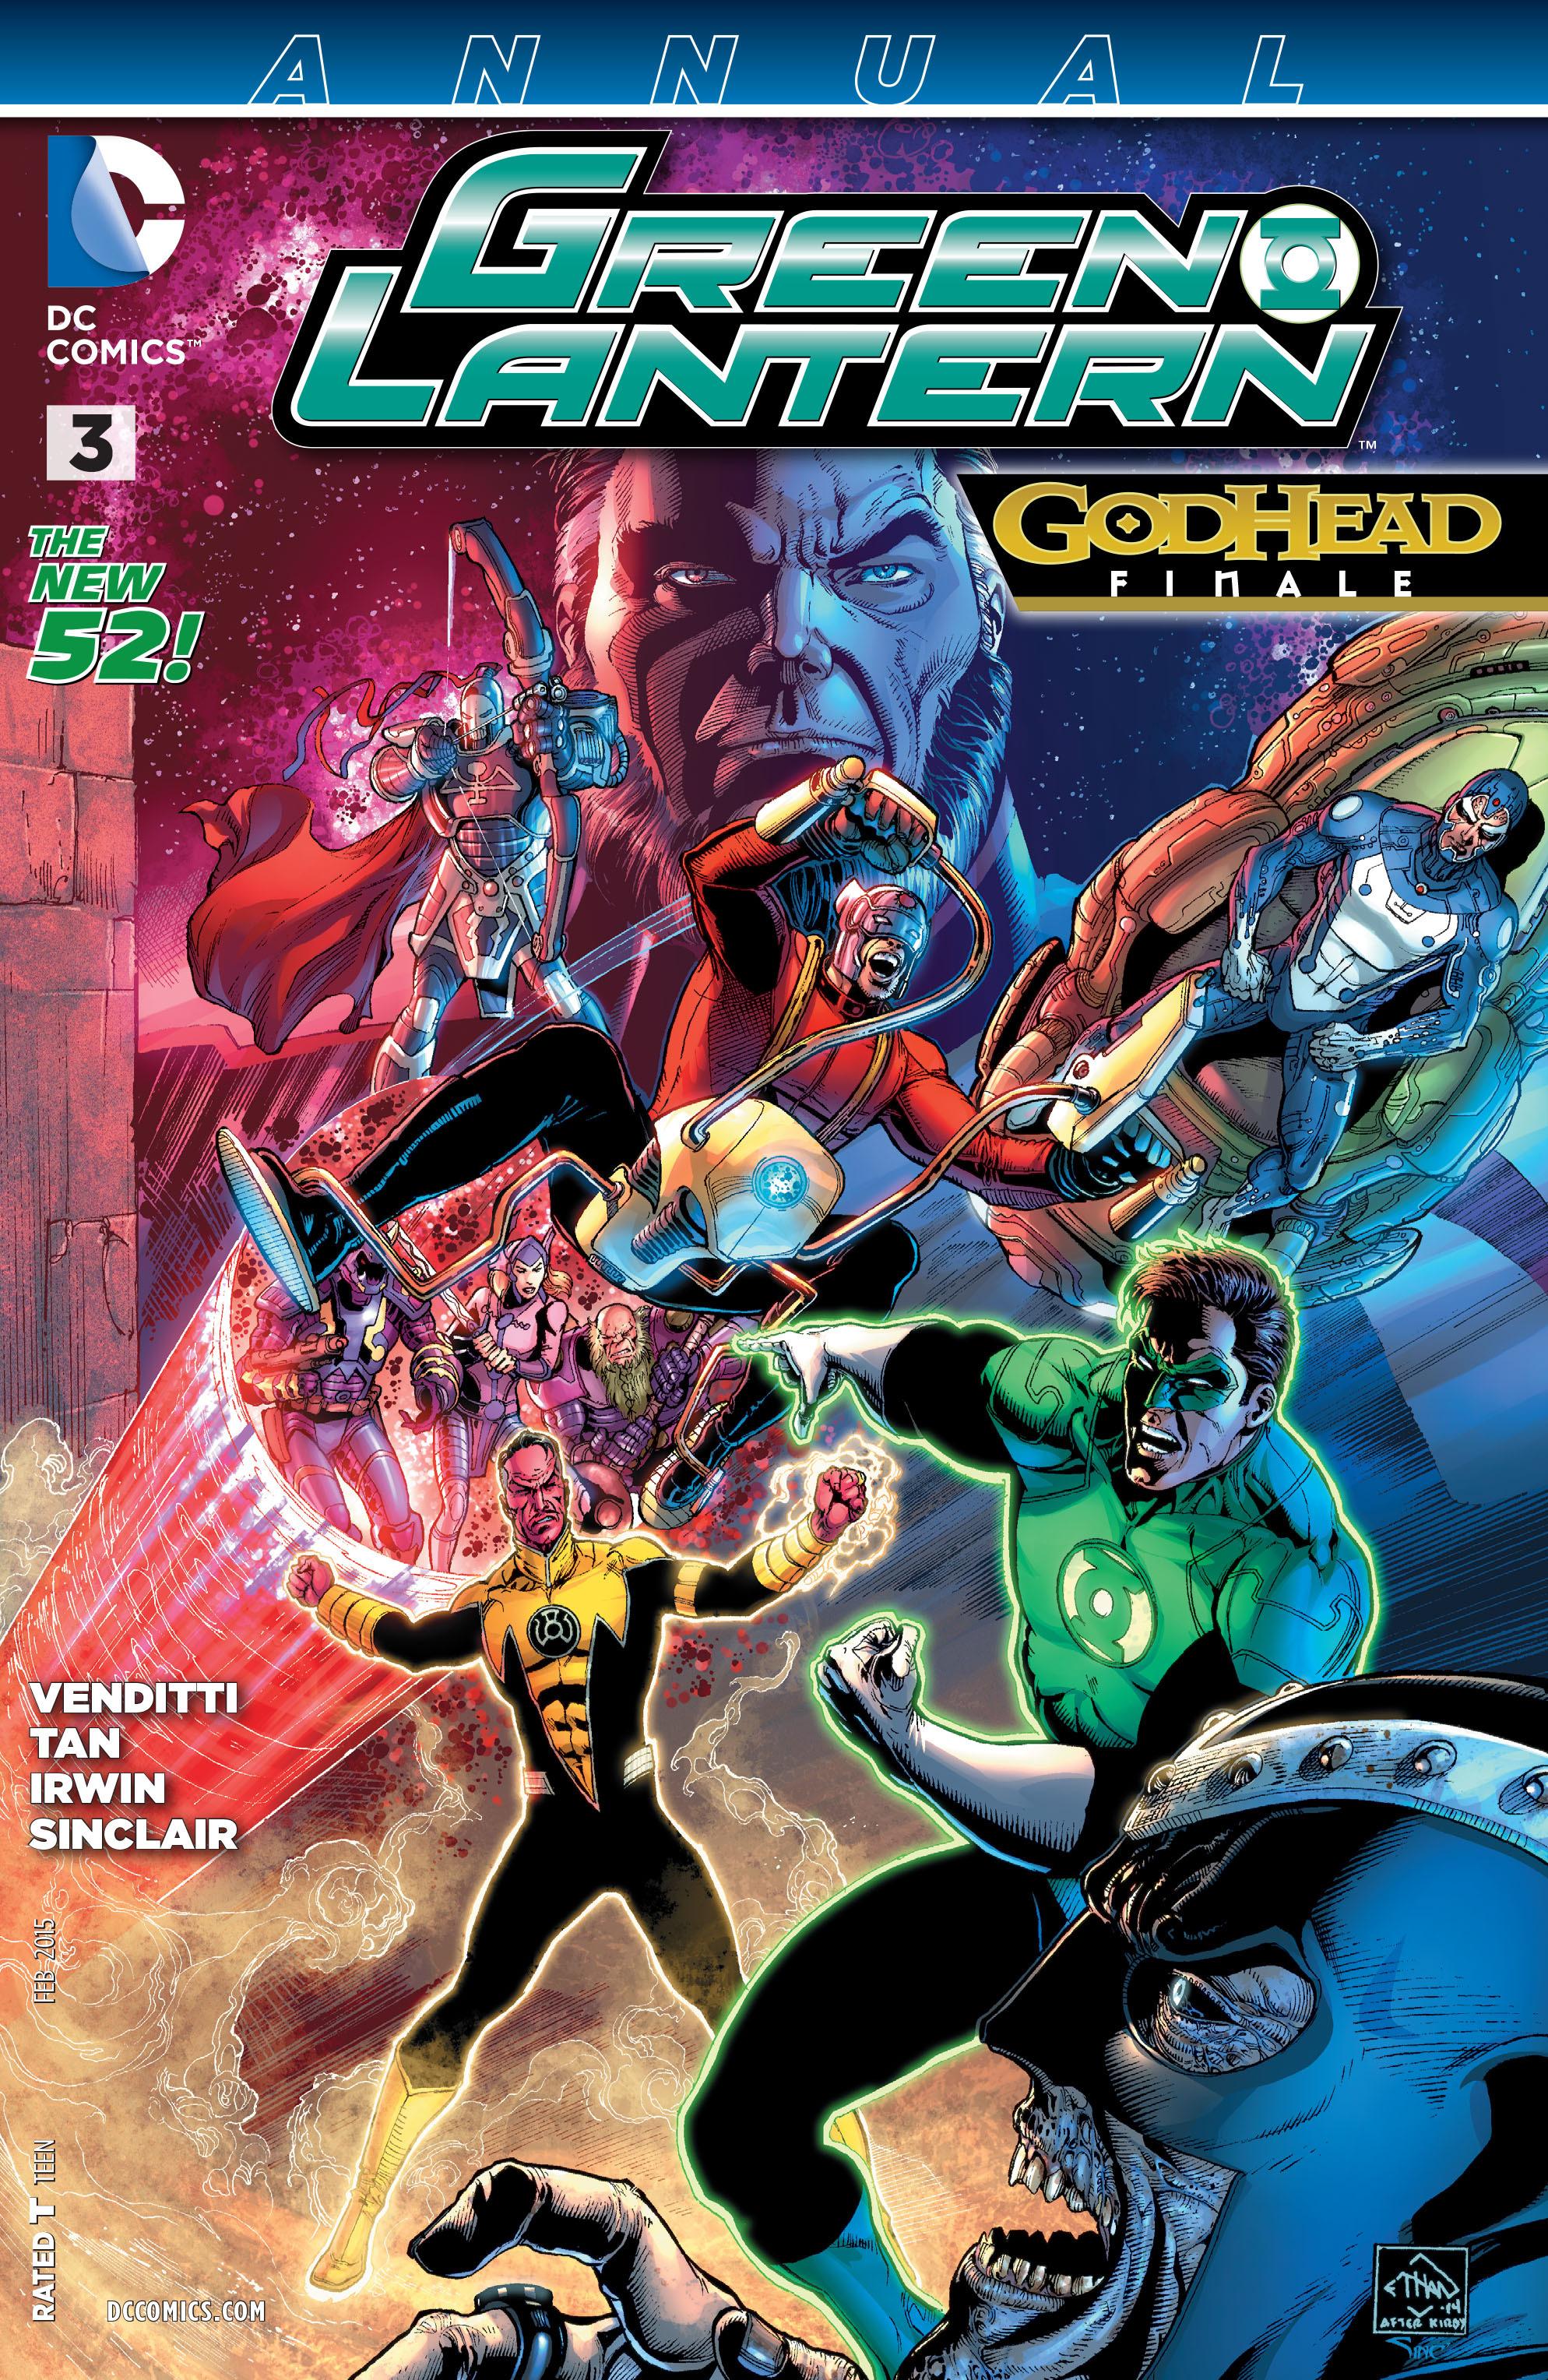 Green Lantern/New Gods: Godhead 17 Page 1